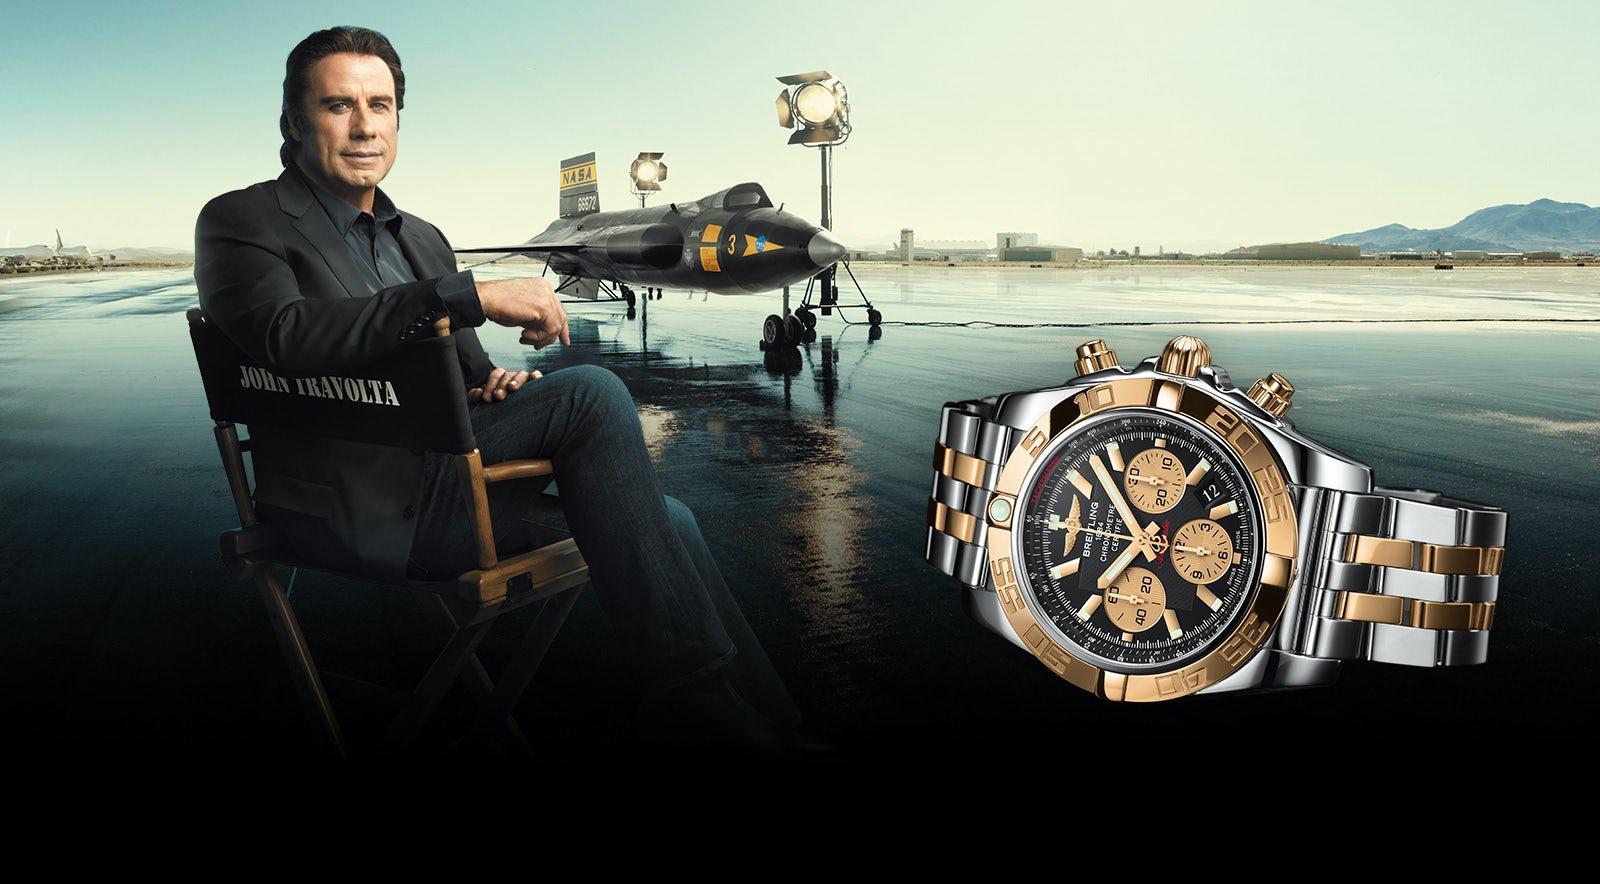 John Travolta in Breitling campaign   Source: Courtesy